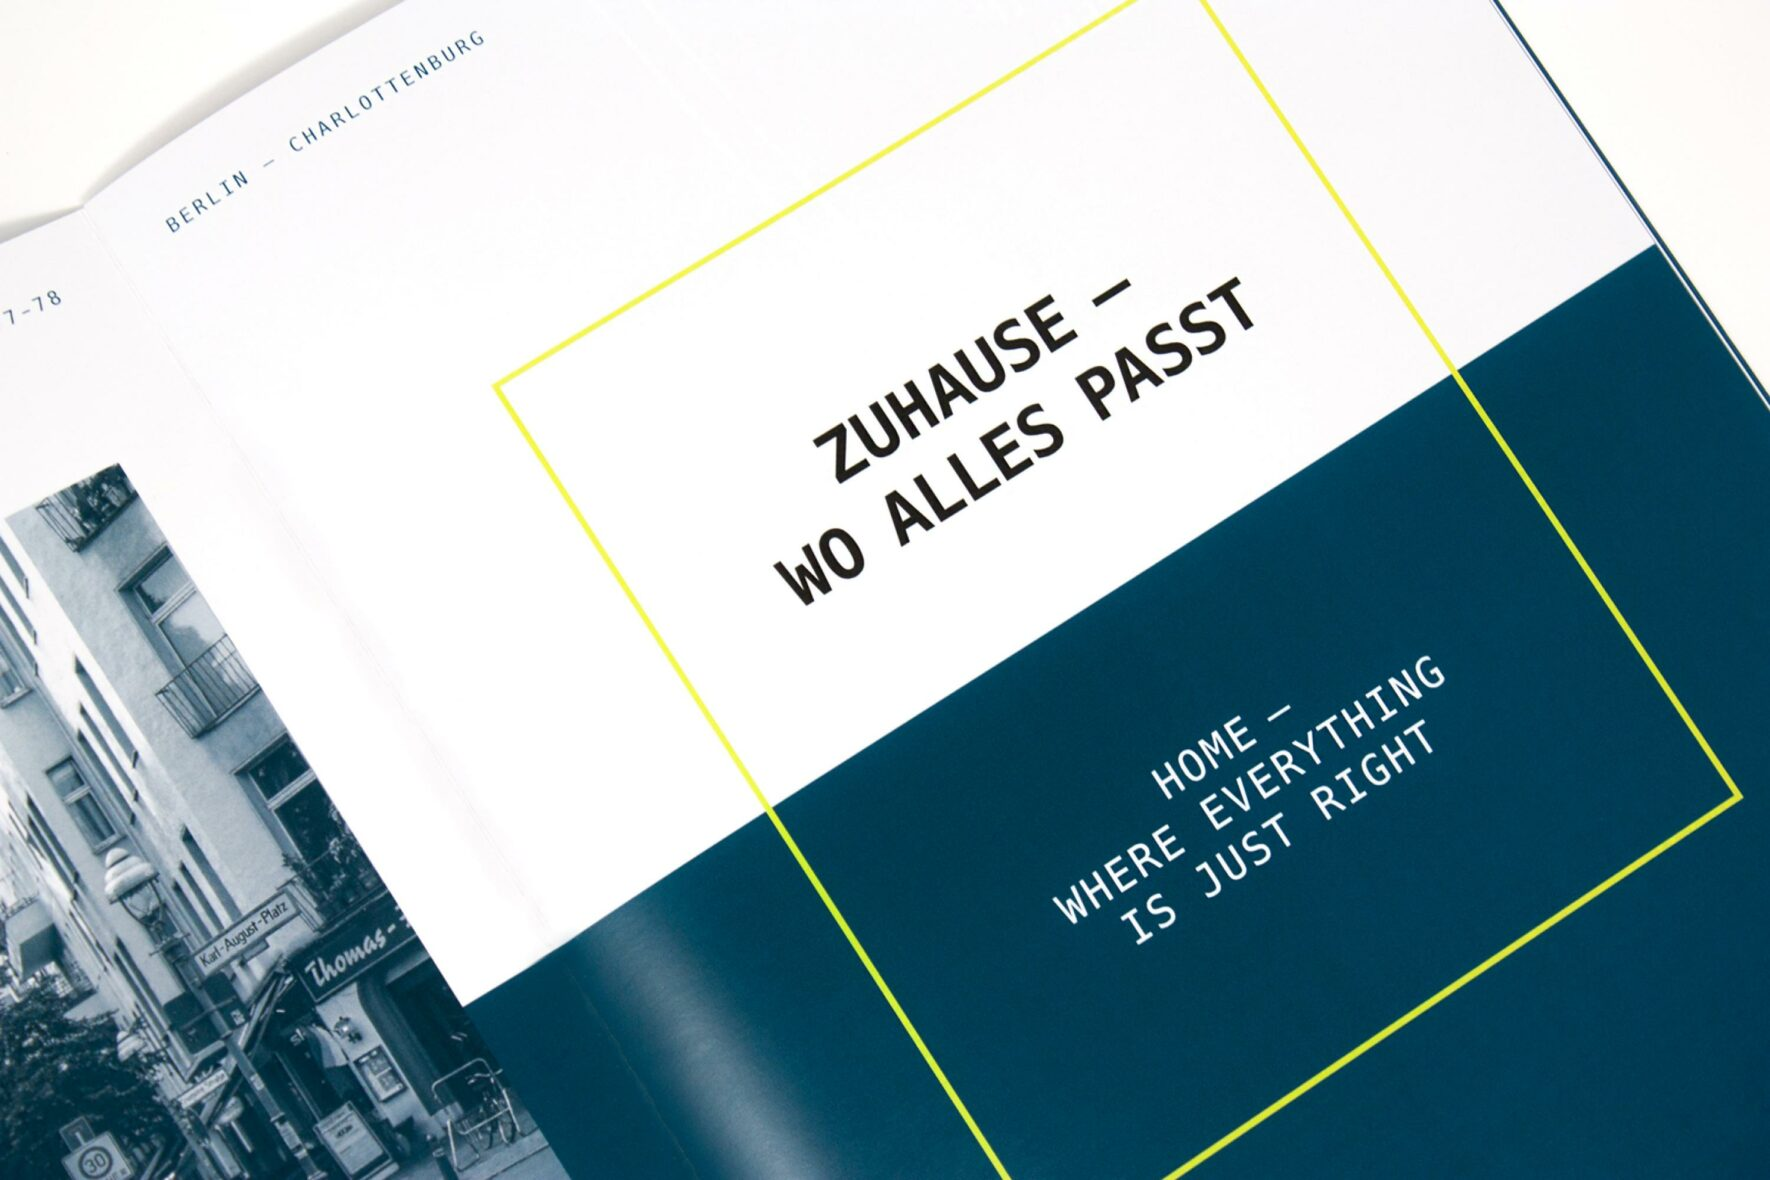 Broschuere-Leibniz-Immobilienbranding-Trendcity-FORMLOS-berlin-Print39